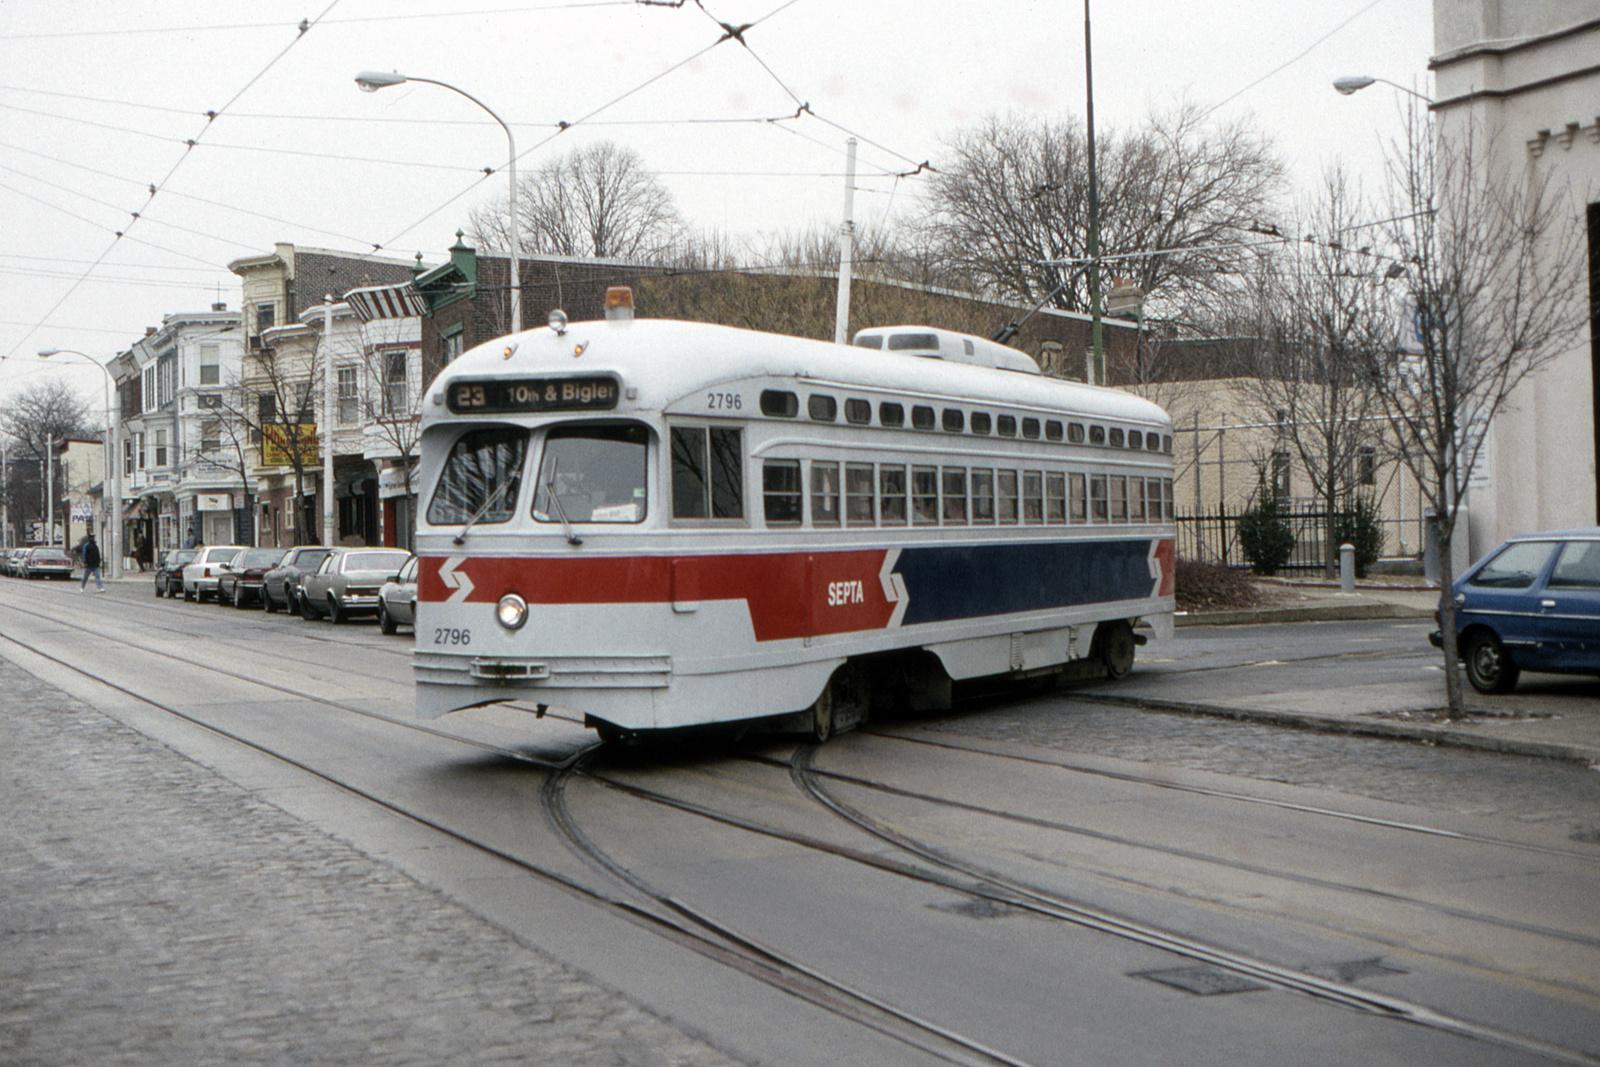 (827k, 1600x1067)<br><b>Country:</b> United States<br><b>City:</b> Philadelphia, PA<br><b>System:</b> SEPTA (or Predecessor)<br><b>Line:</b> Rt. 23-Germantown<br><b>Location:</b> Germantown Depot<br><b>Car:</b> PTC/SEPTA Postwar All-electric PCC (St.Louis, 1947) 2796 <br><b>Collection of:</b> David Pirmann<br><b>Date:</b> 2/13/1992<br><b>Viewed (this week/total):</b> 0 / 64